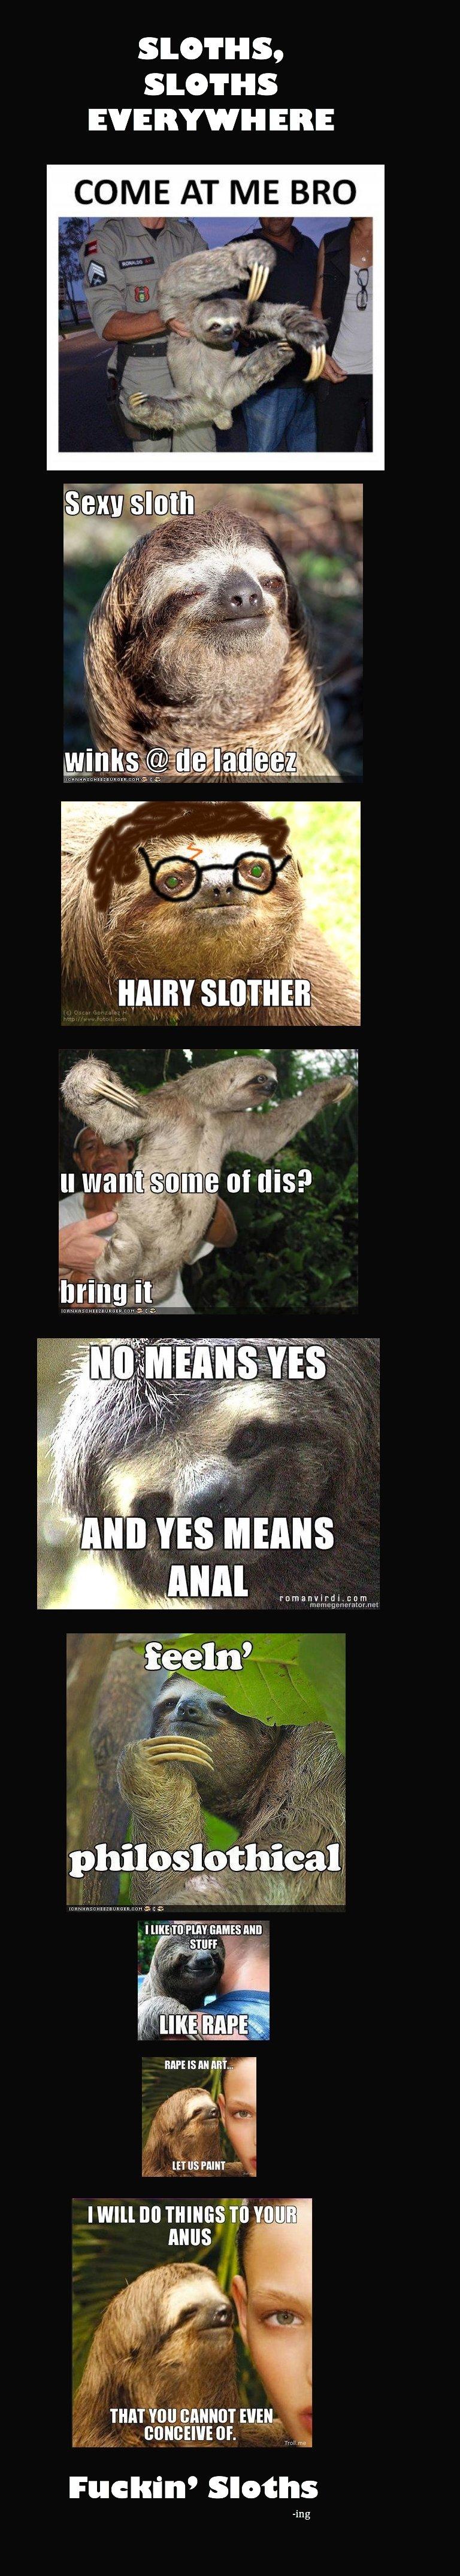 Sloths.. THEY DERK AR DURRR. dickbutt dedz to pheel. Elli COME AT ME BRO I WE P FUN cums Mo RAPE IS an Mi... manna! mm no mimitw mu ANUS THAT VIII] NEIL, Fuckin derp